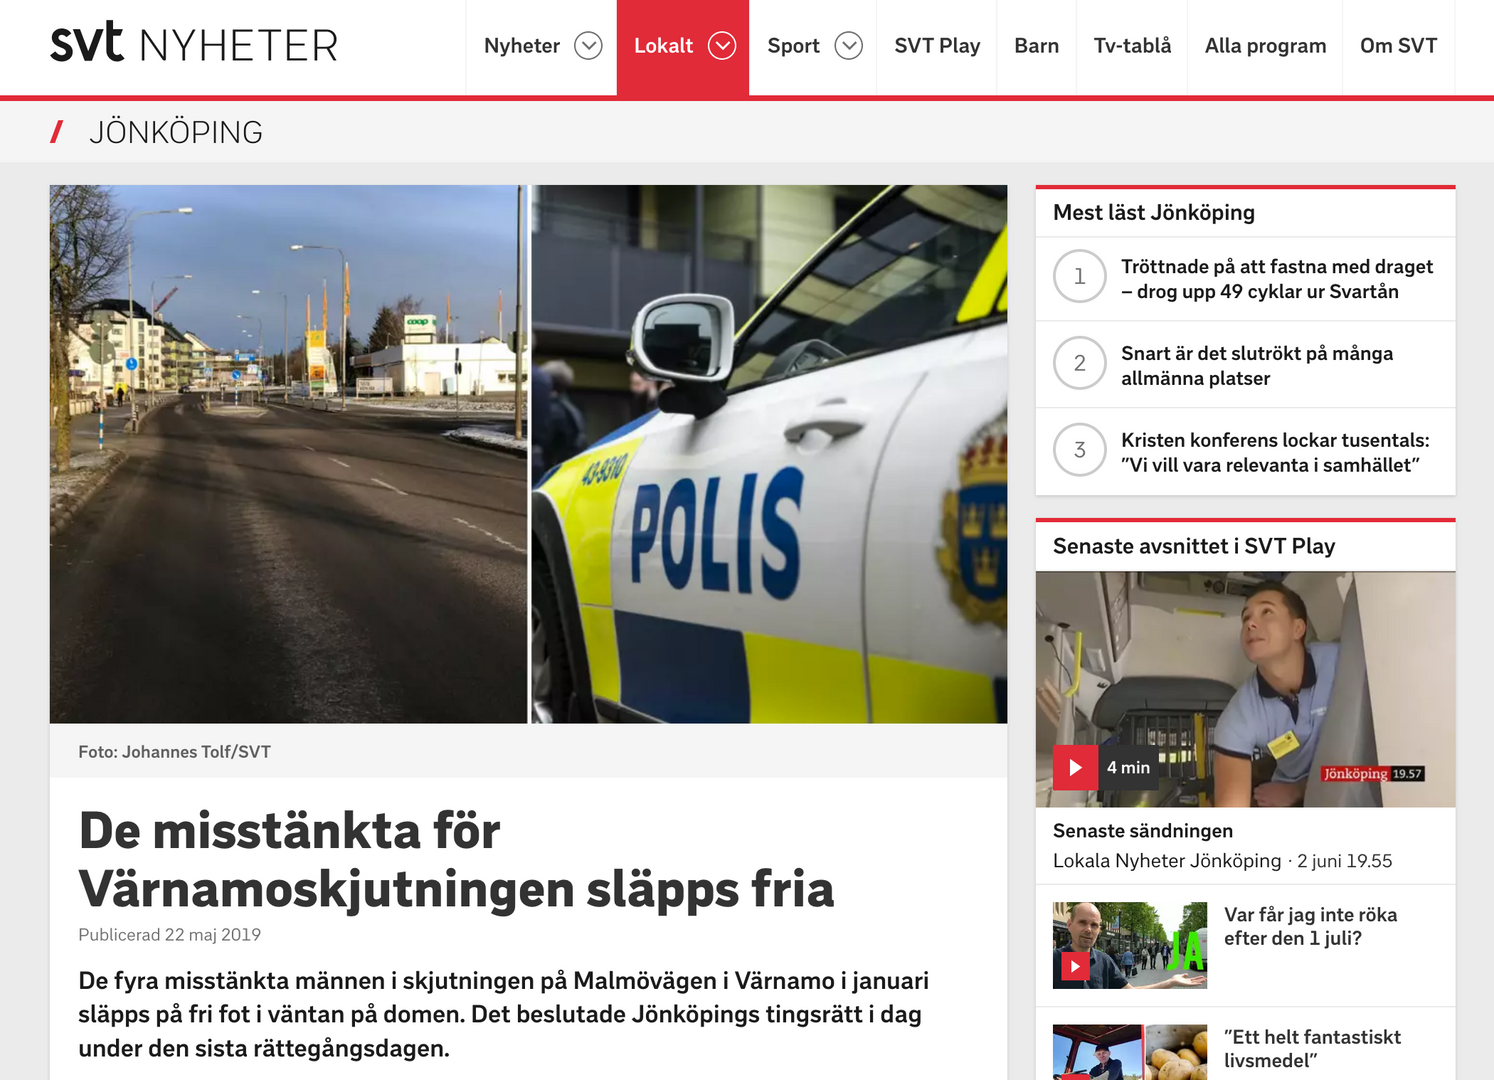 SVT Nyheter - Lundell Sjölander